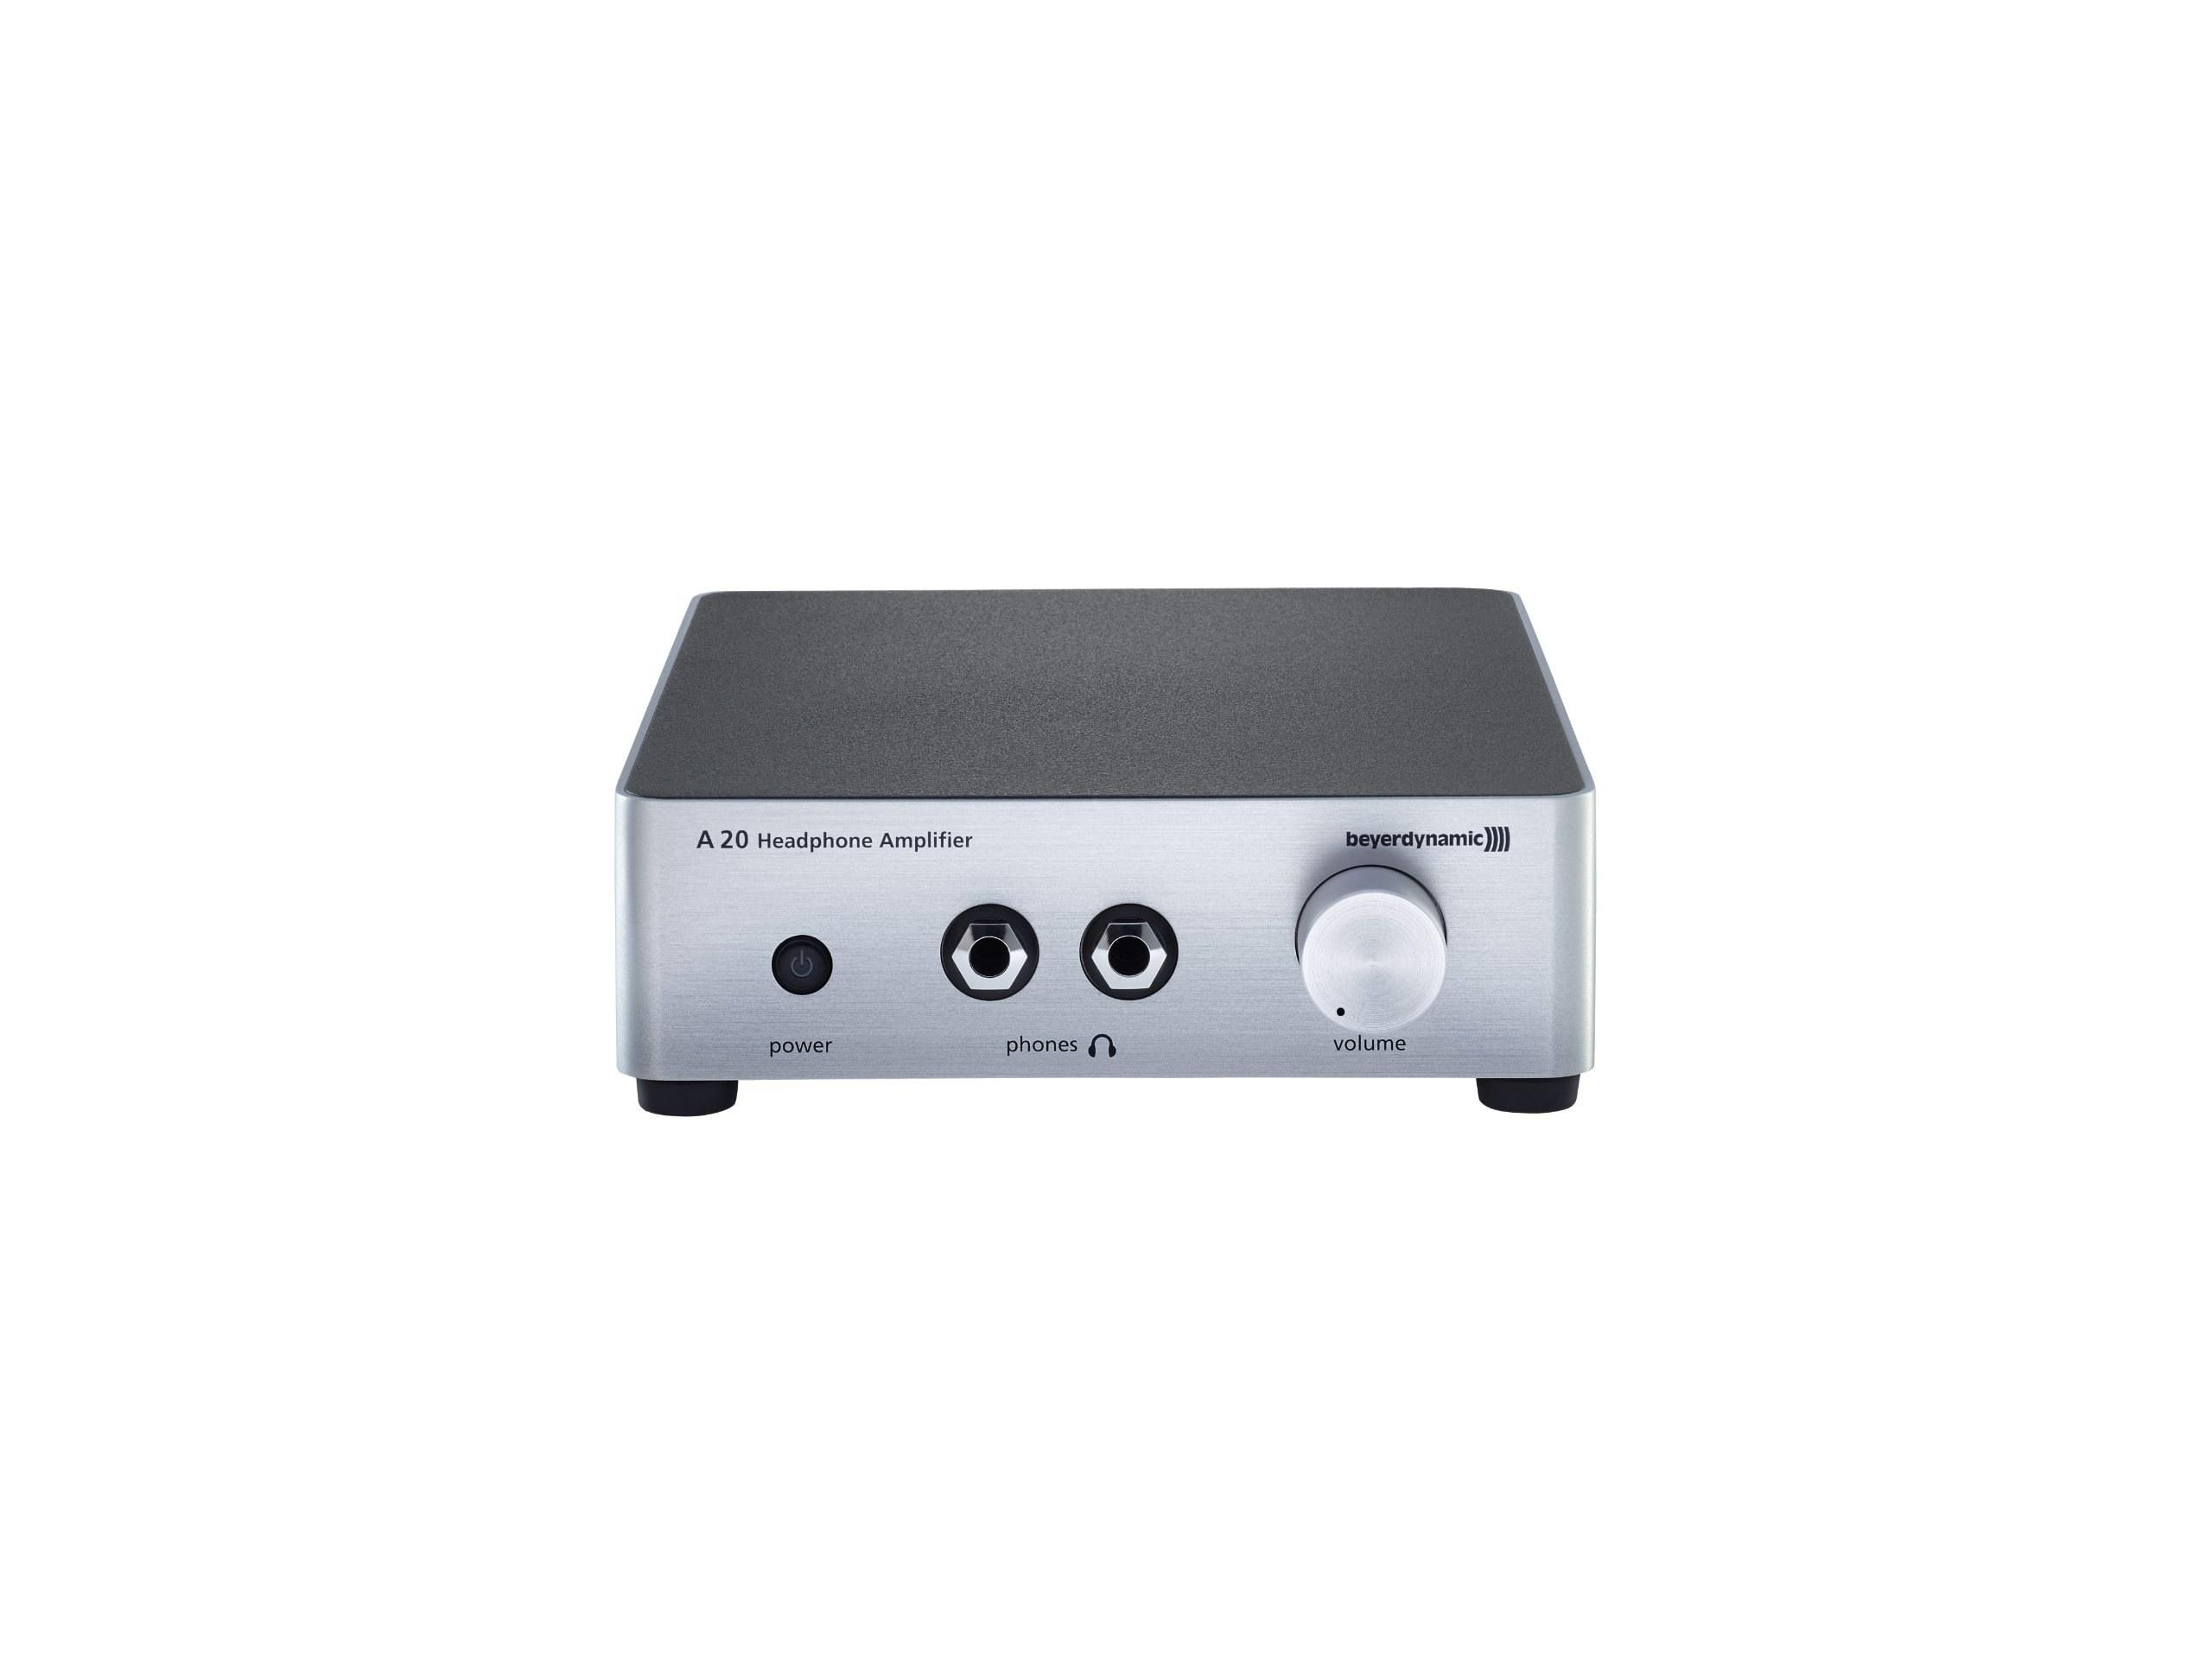 عکس beyerdynamic A20 Headphone Amplifier - Silver  beyerdynamic-a20-headphone-amplifier-silver